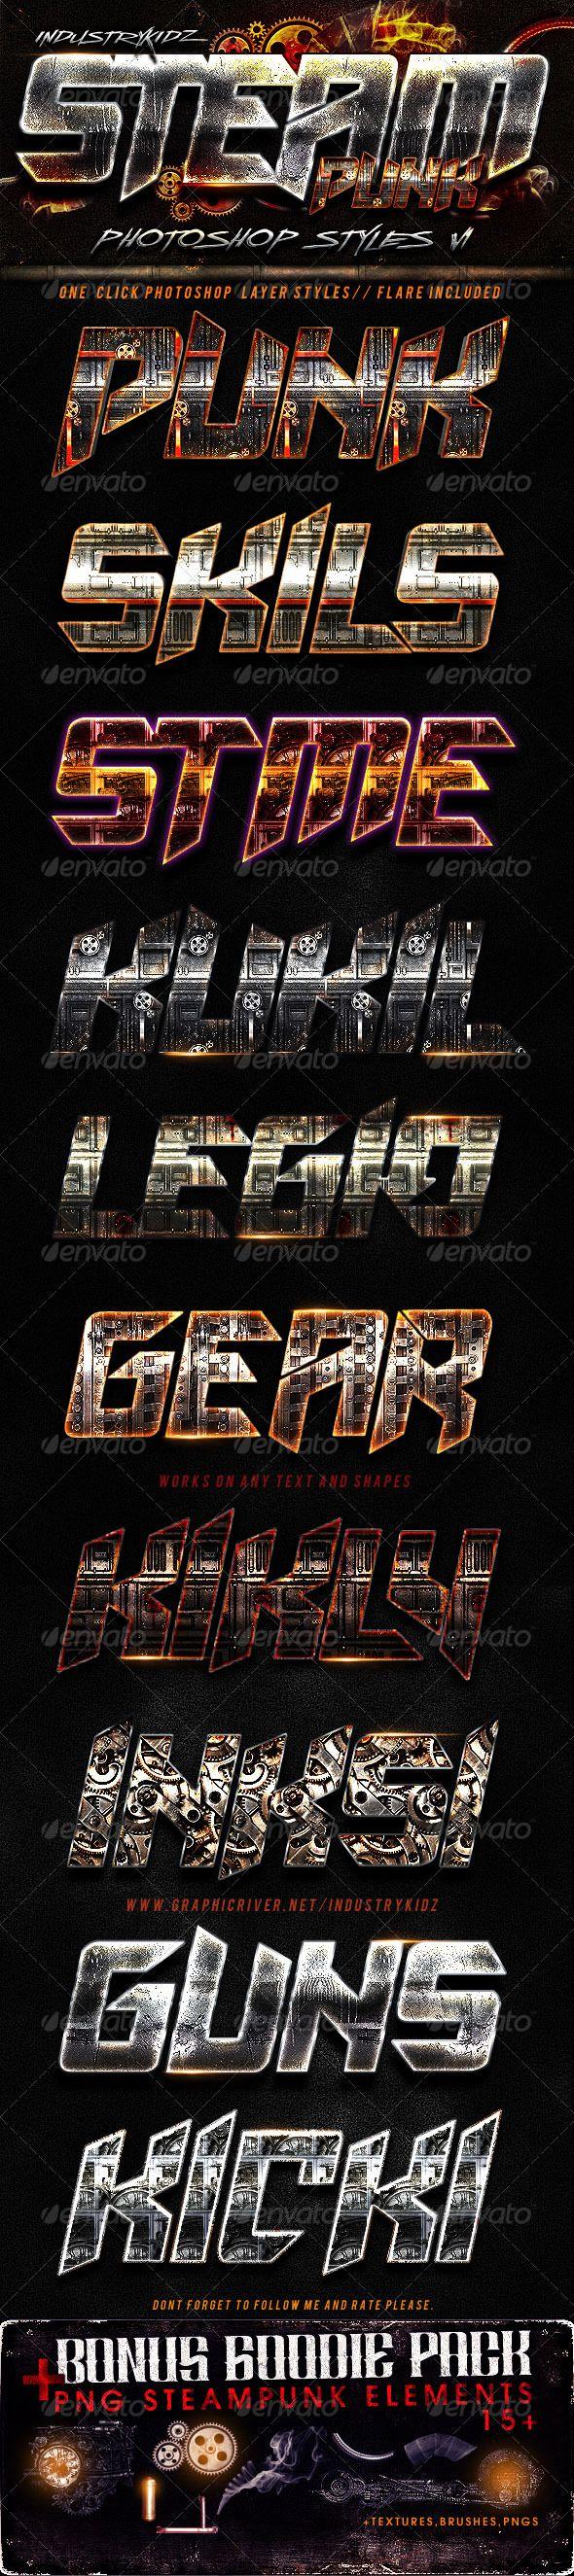 SteamPunk Photoshop Styles